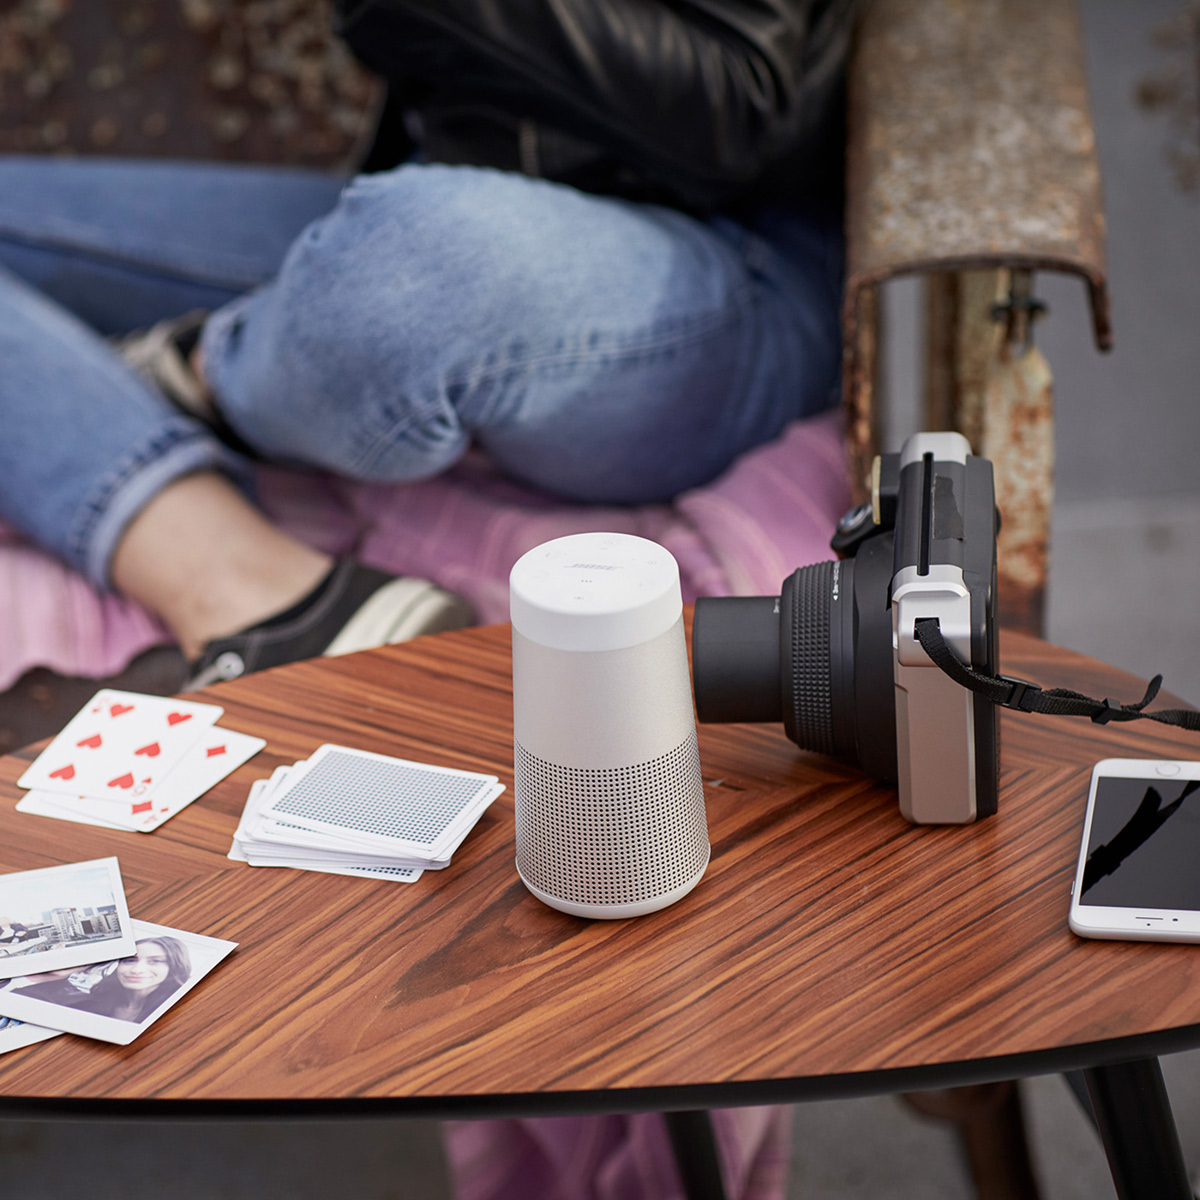 Bose-SoundLink-Revolve-Portable-Bluetooth-Speaker thumbnail 15